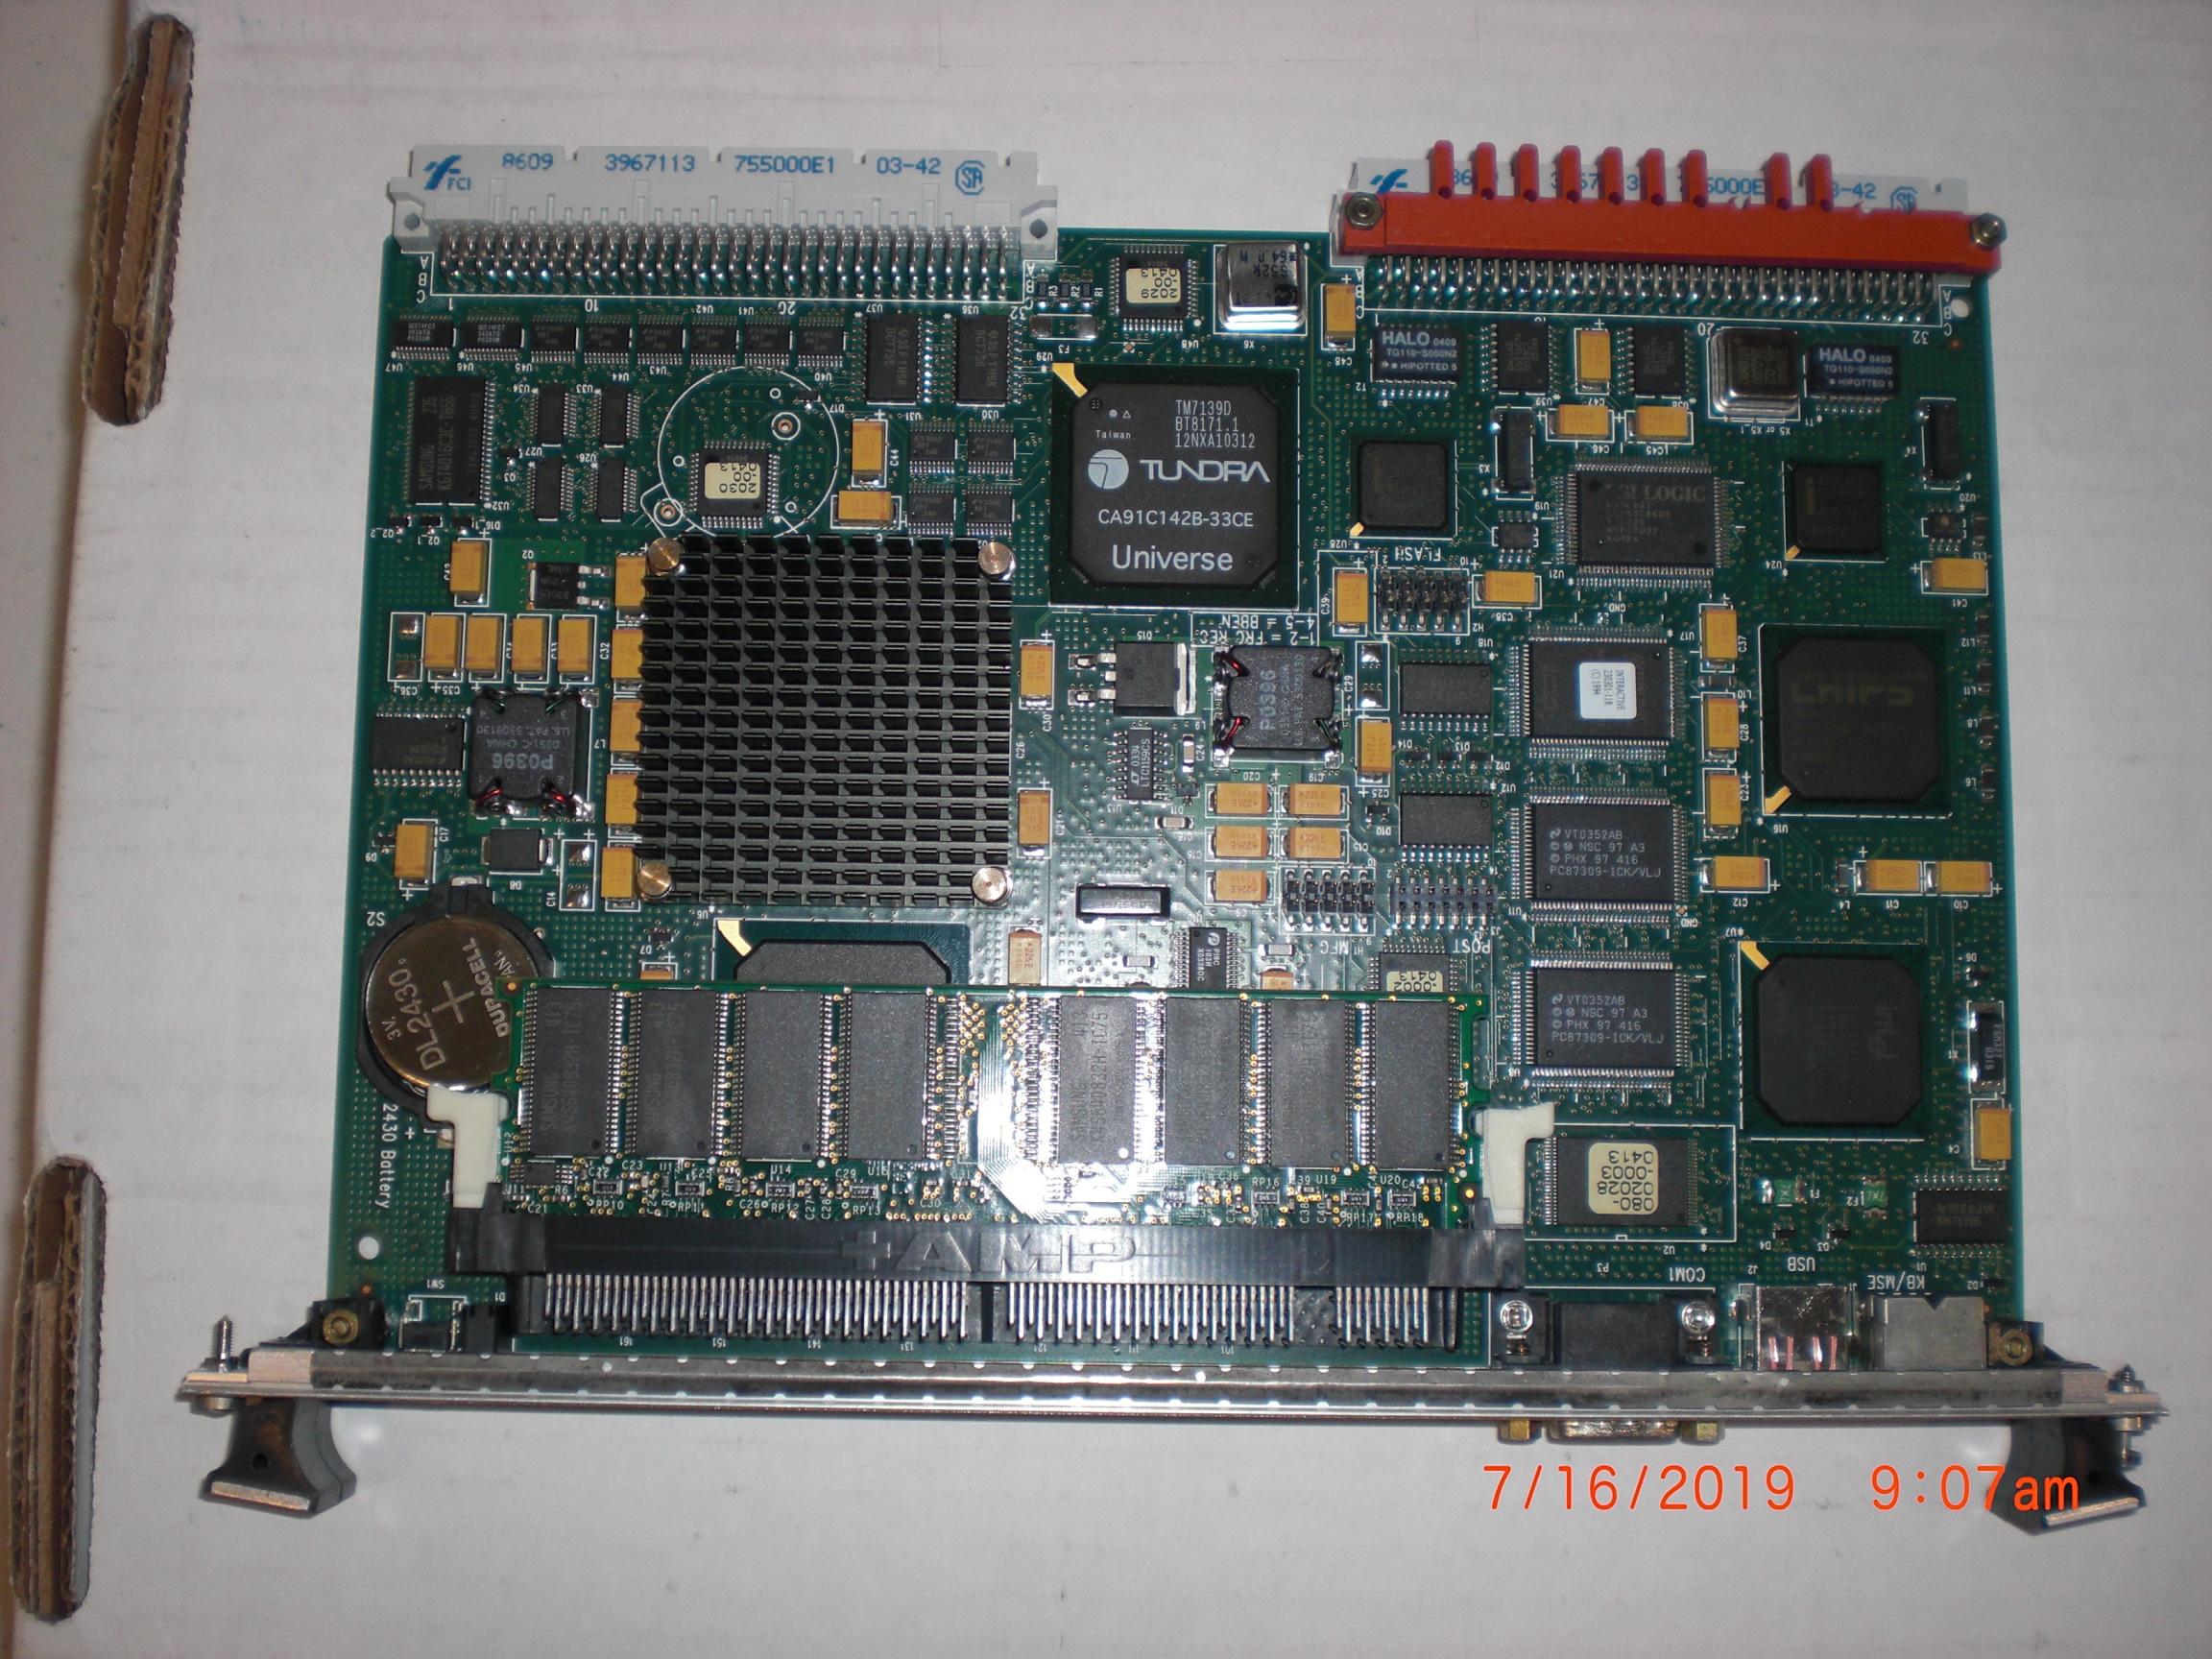 PCB Applied Materials (AMAT) 0190-11528 CARD PIII 400MHZ 128MB RAM VME BUS SINGL